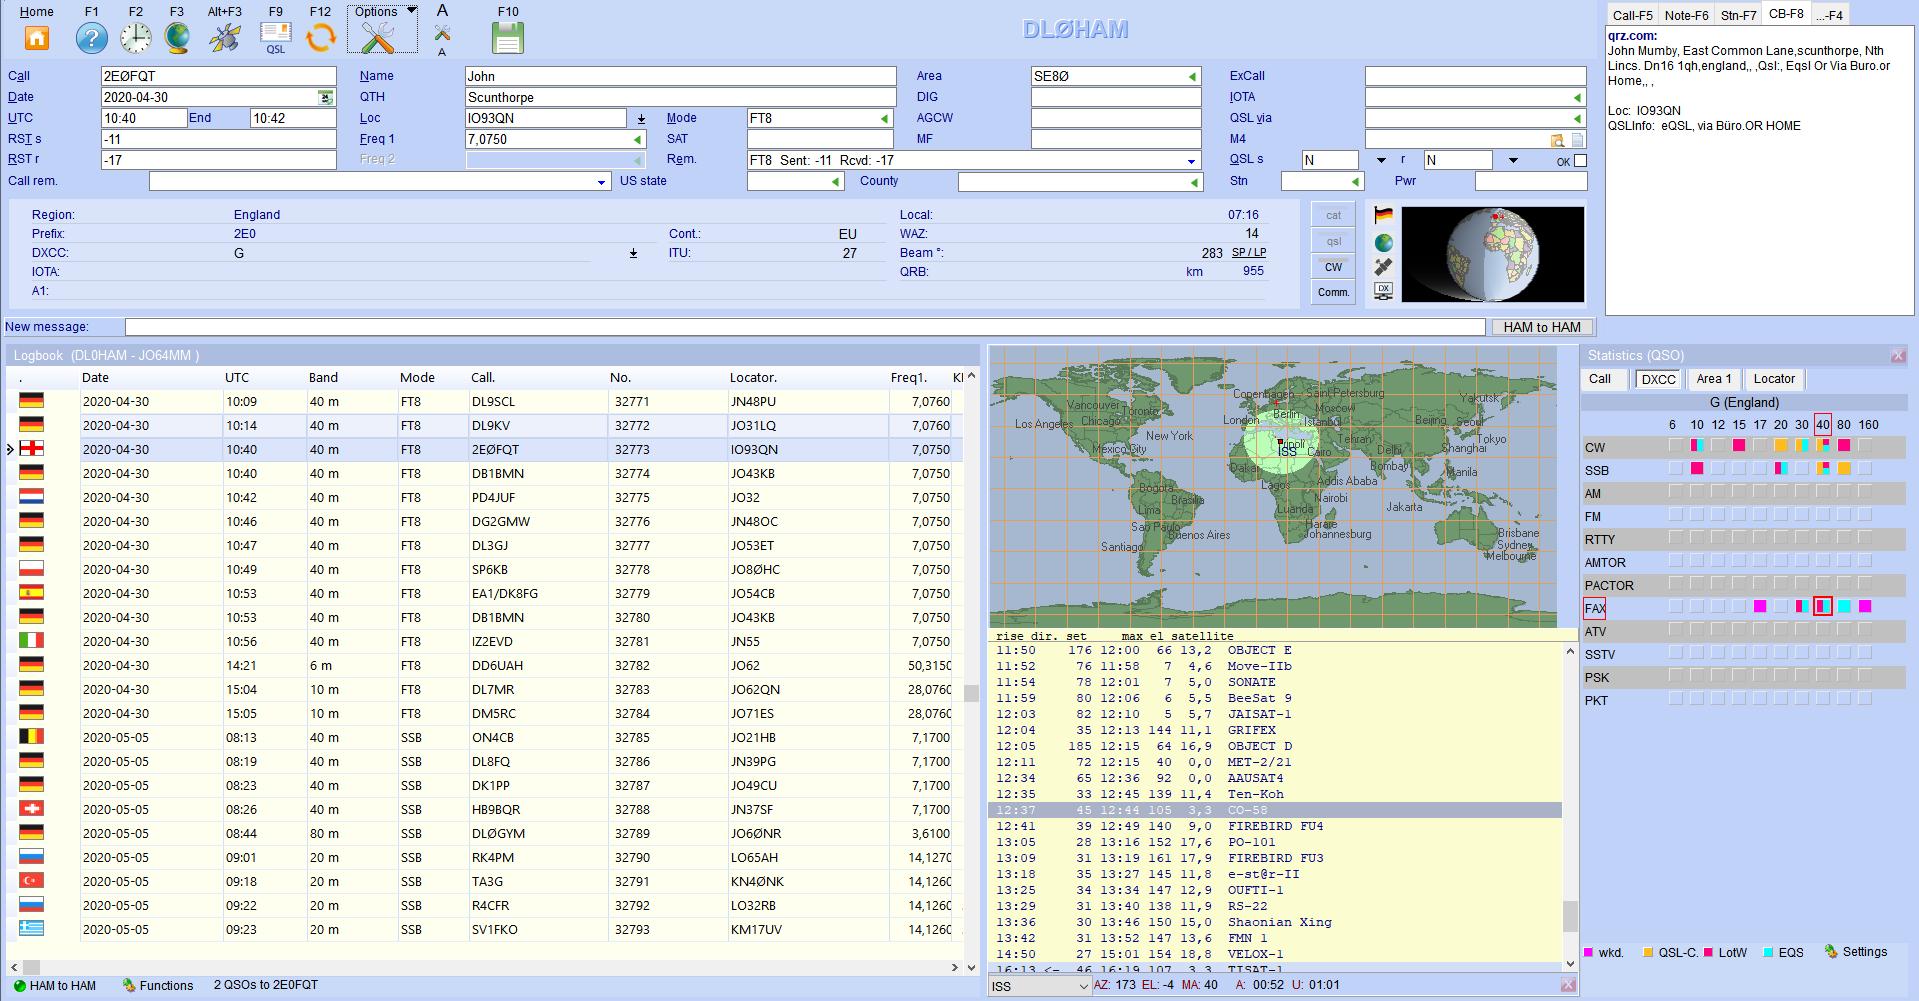 qso-input stellites staistics hamoffice my amateur radio logbook